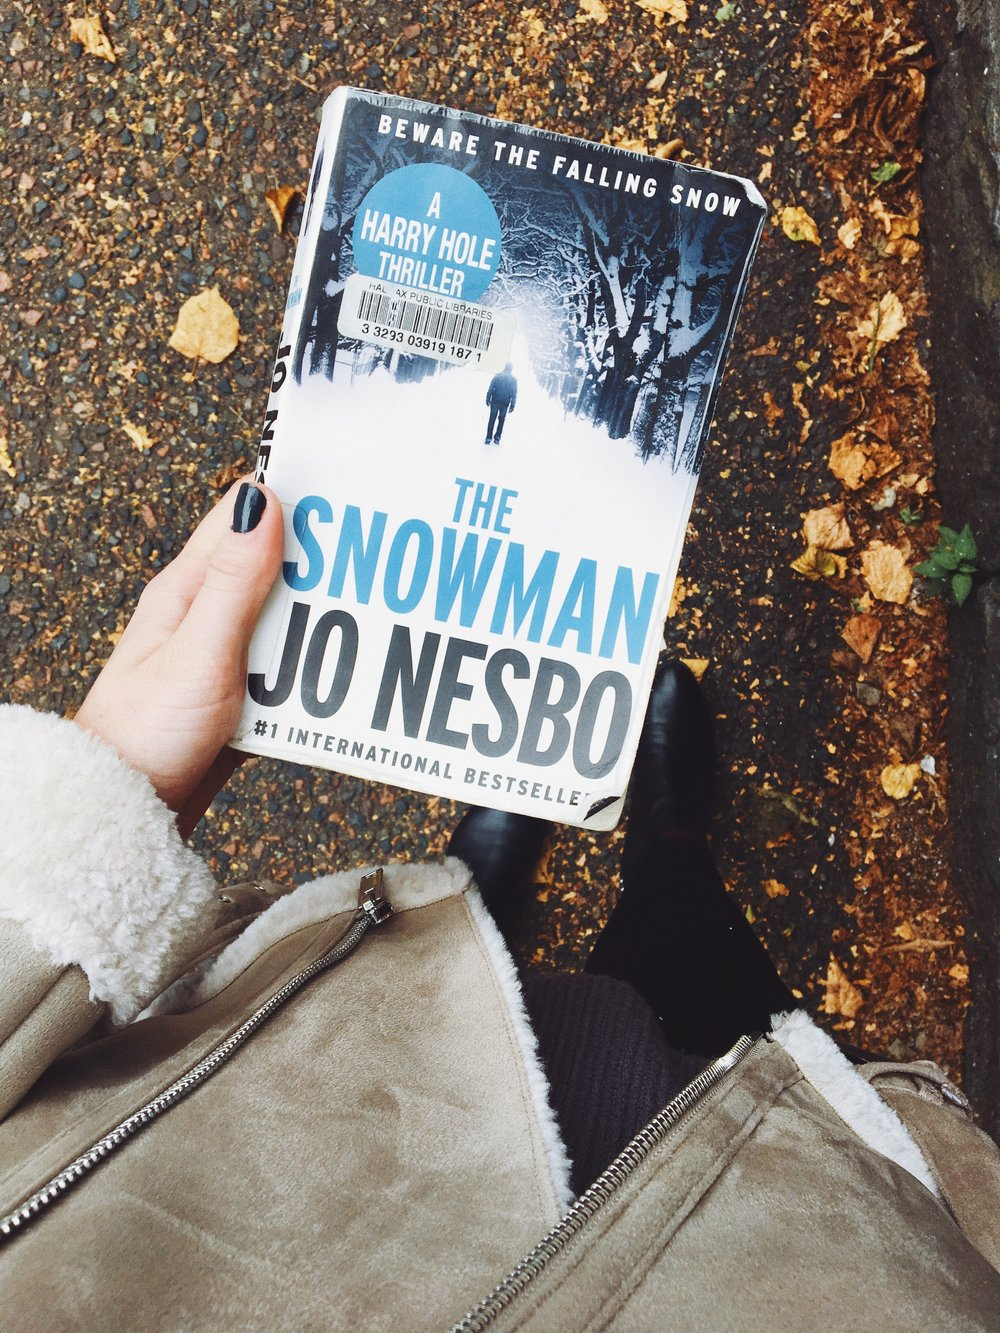 """Beware the falling snow."" -"